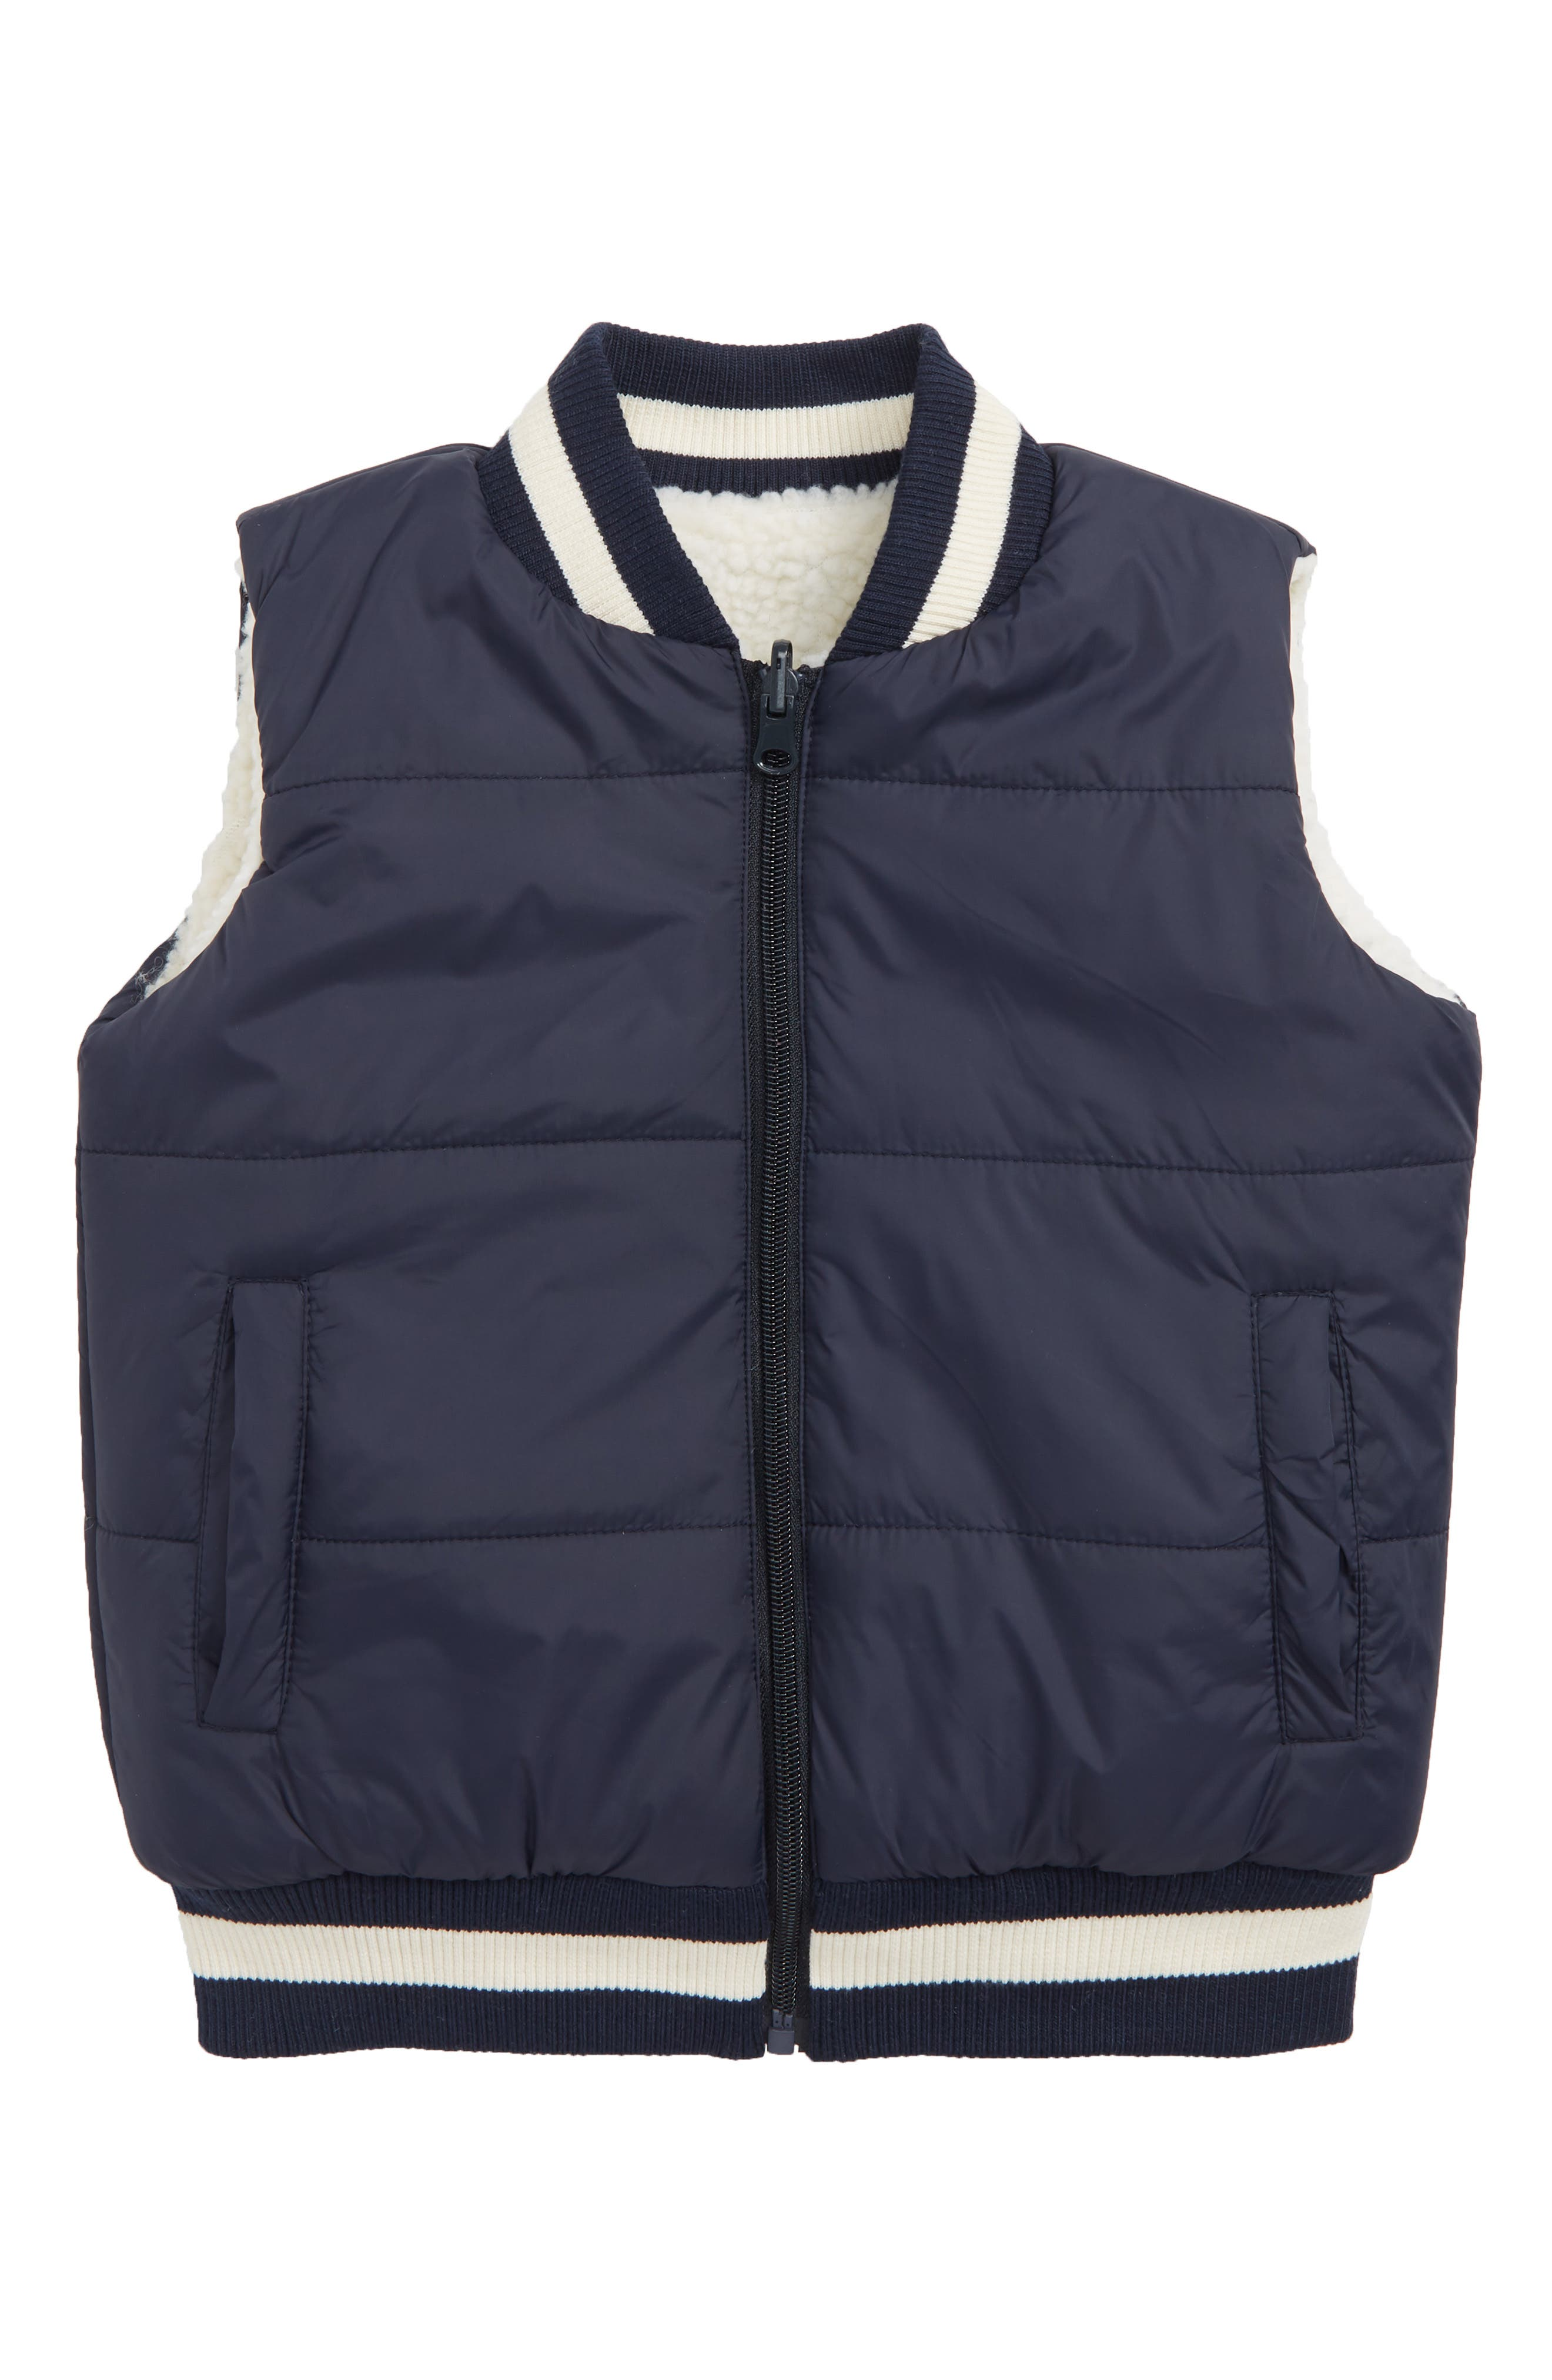 Reversible Puffer Vest,                             Main thumbnail 1, color,                             NAVY